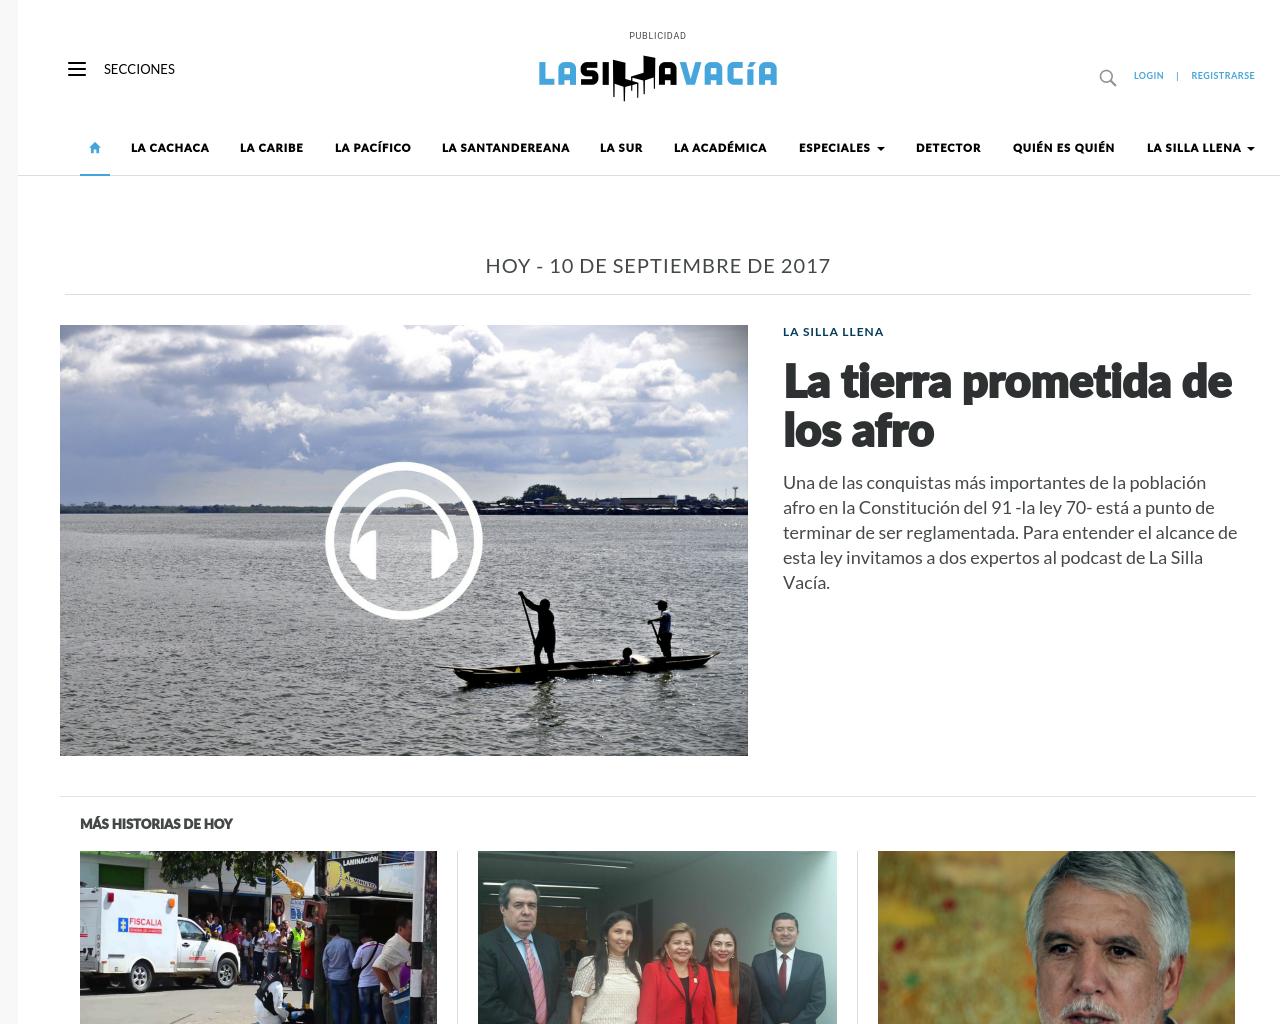 La-Silla-Vacia-(The-Empty-Chair)-Advertising-Reviews-Pricing